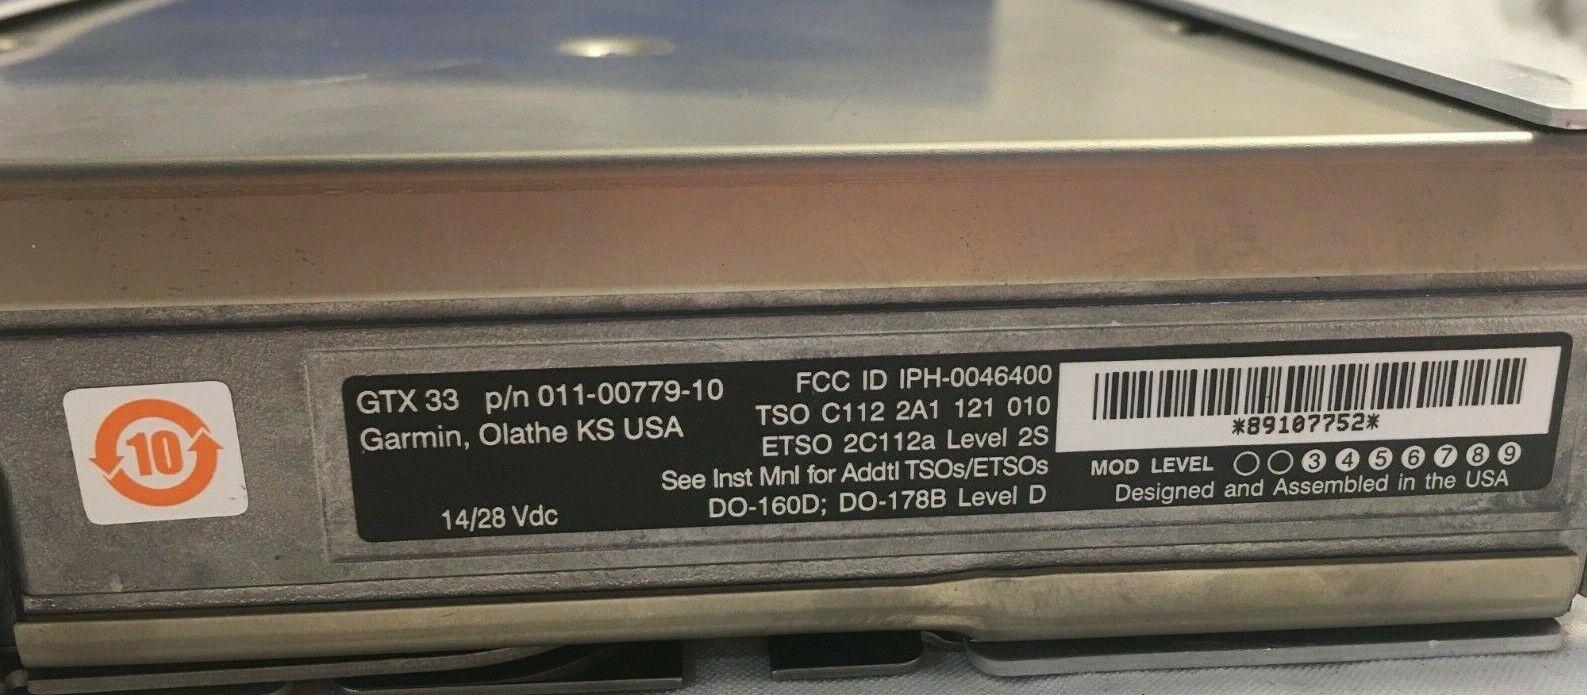 Garmin GTX 33 Transponder Mode S